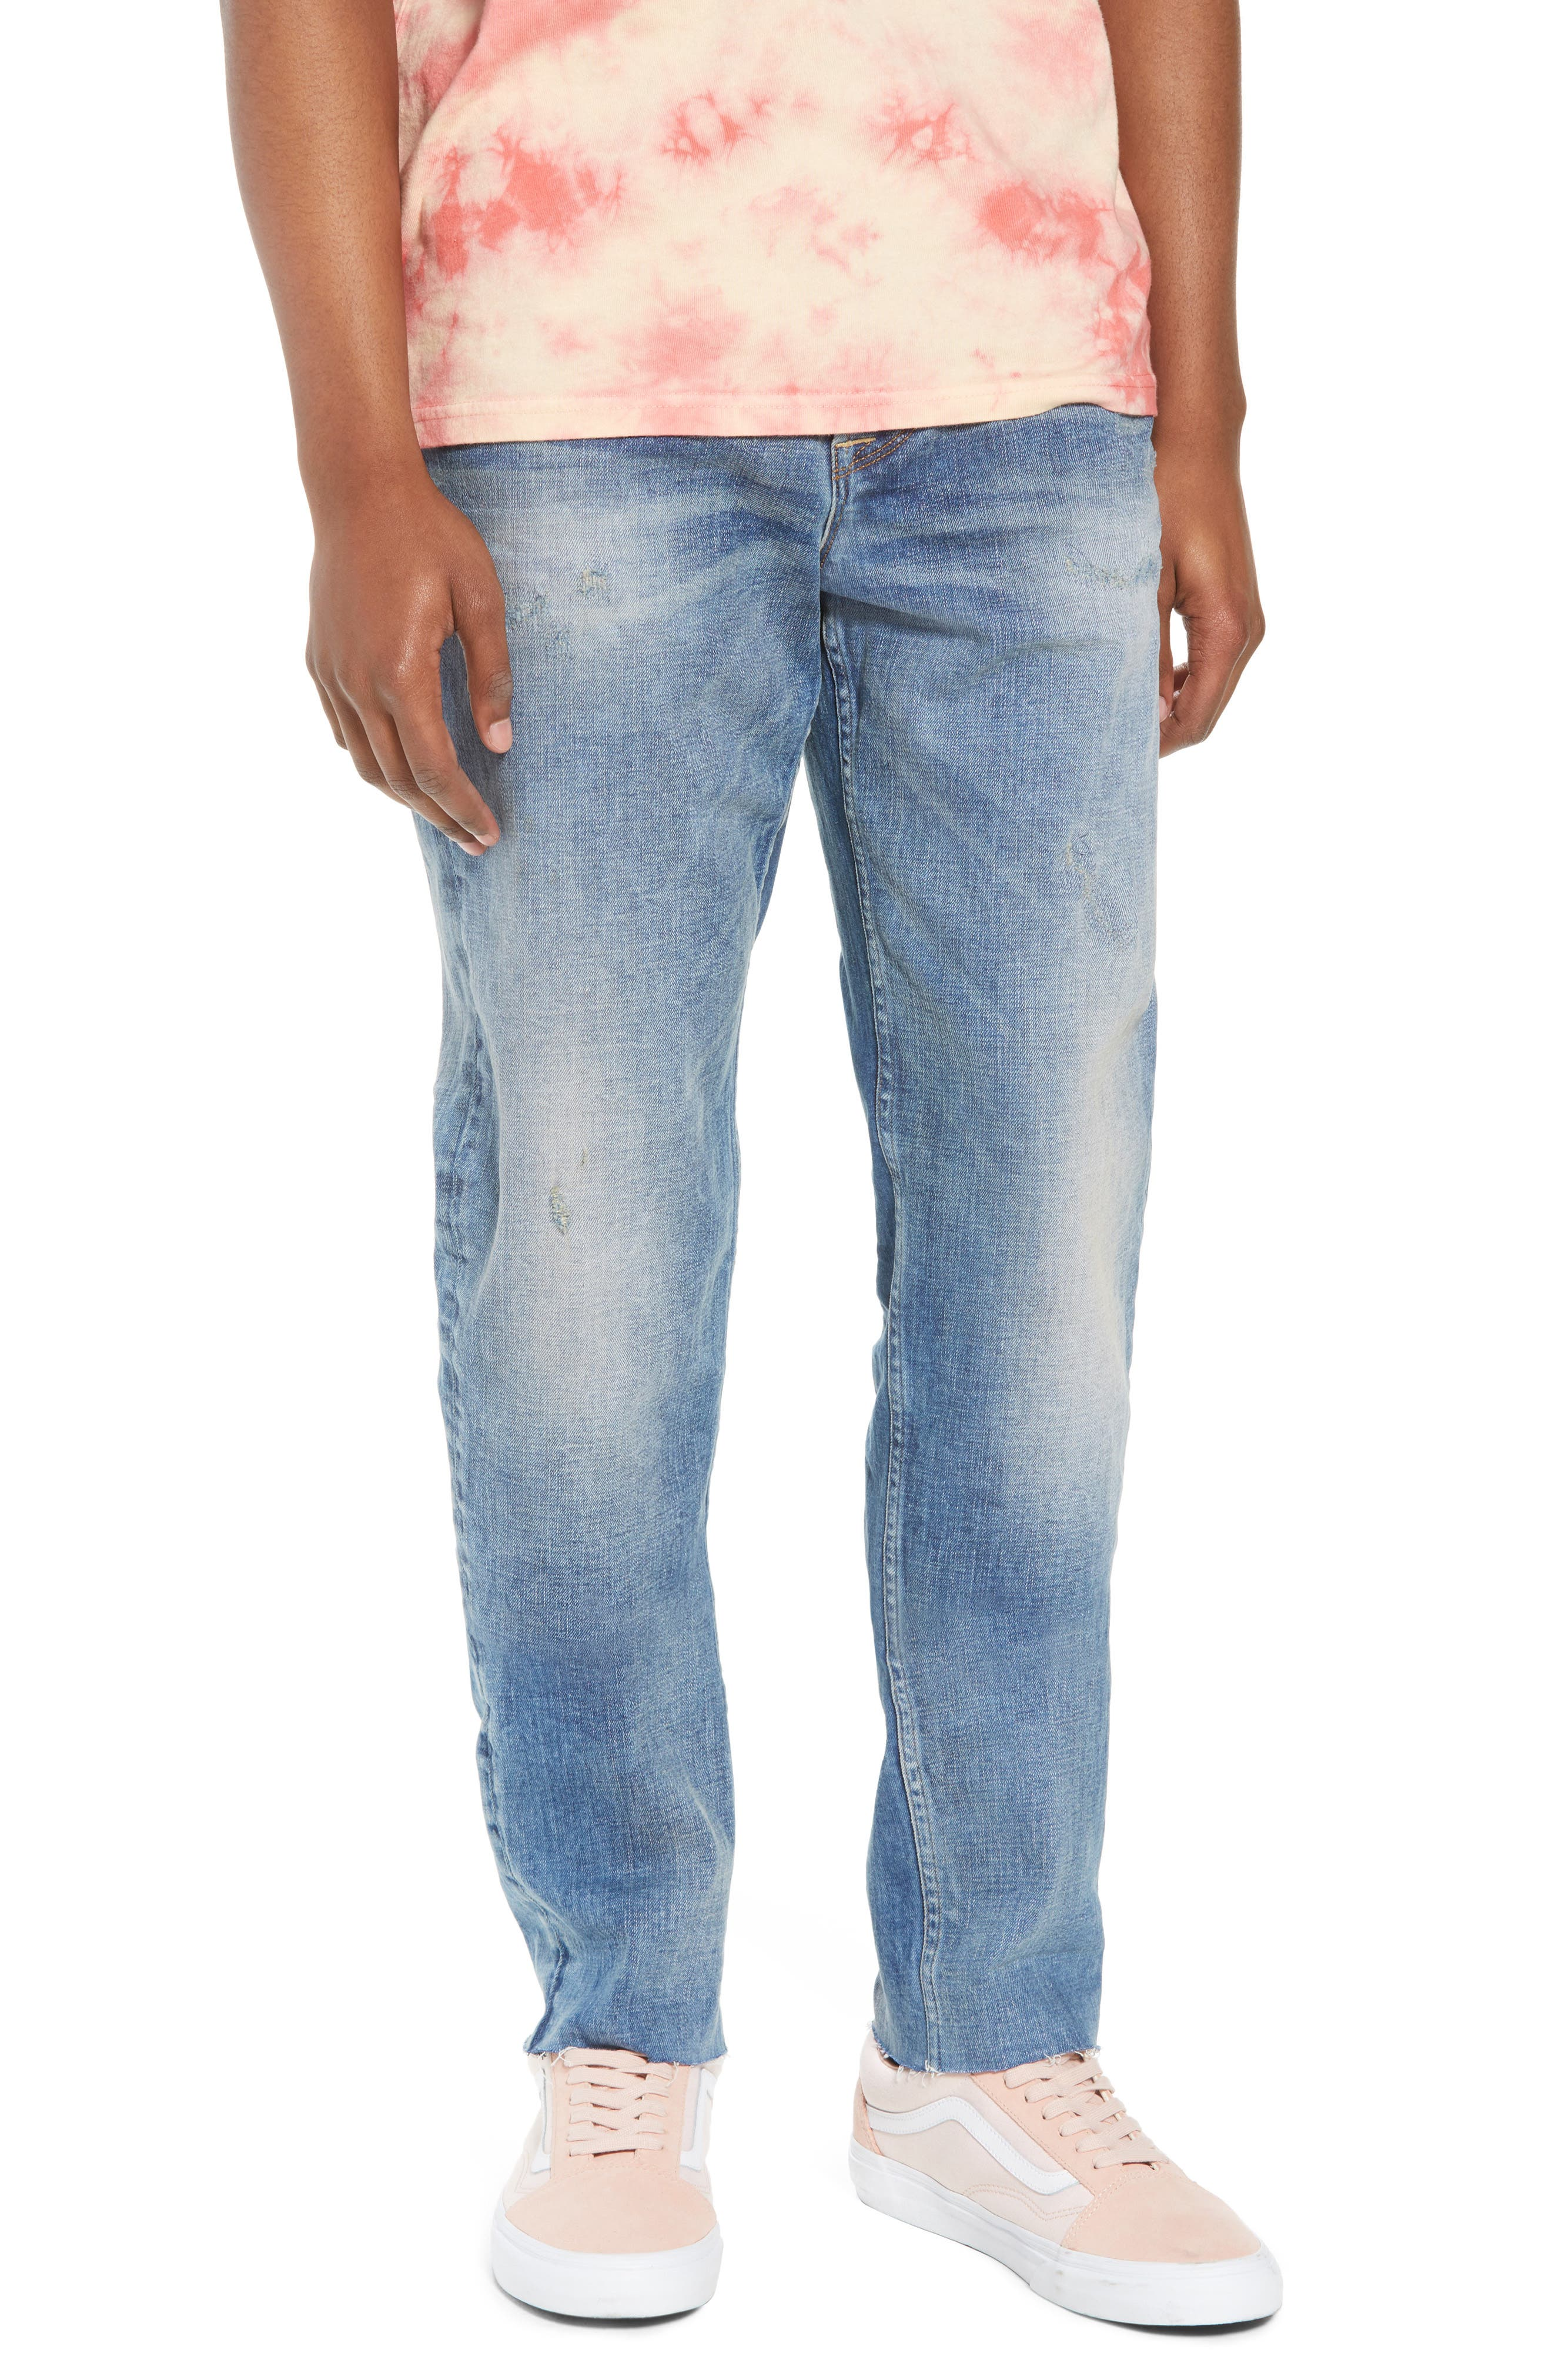 Sartor Slouchy Skinny Fit Jeans,                         Main,                         color, Los Feliz